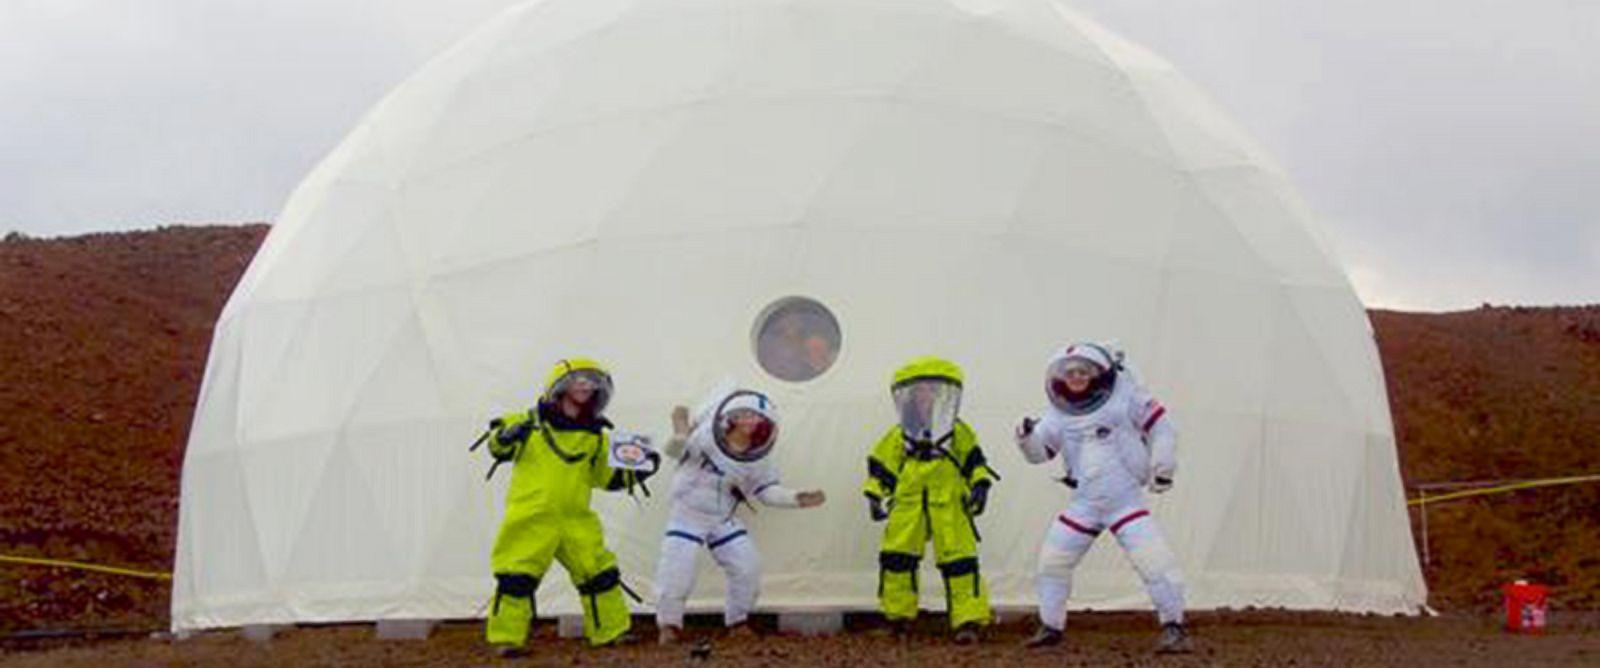 PHOTO: The HI-SEAS Mars Mission crew and simulator at Mauna Loa volcano, in Hawaii.